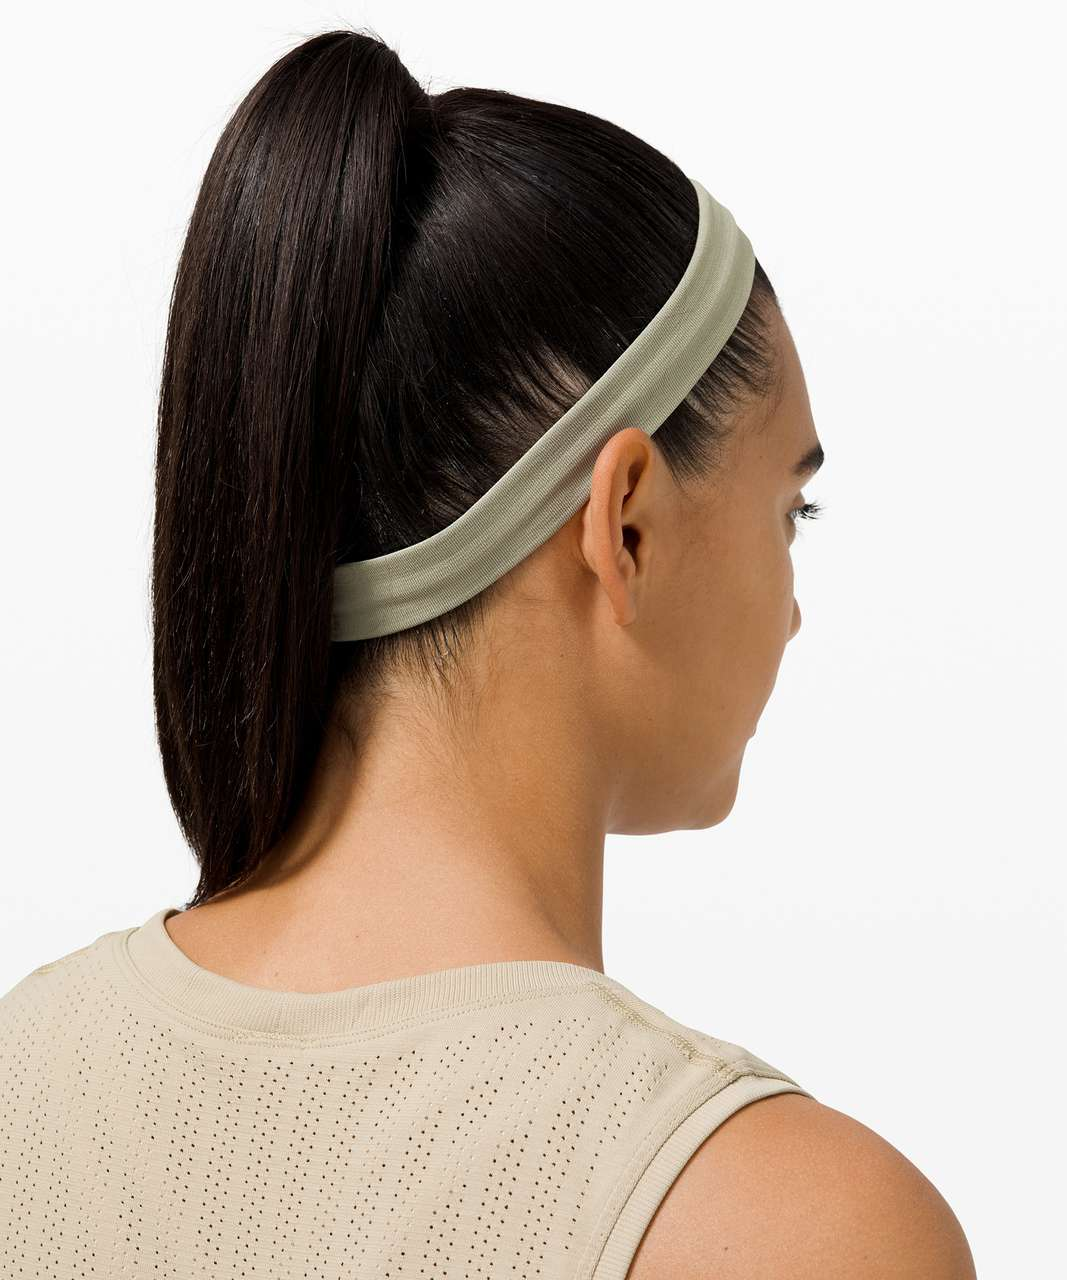 Lululemon Cardio Cross Trainer Headband - Heathered Rosemary Green